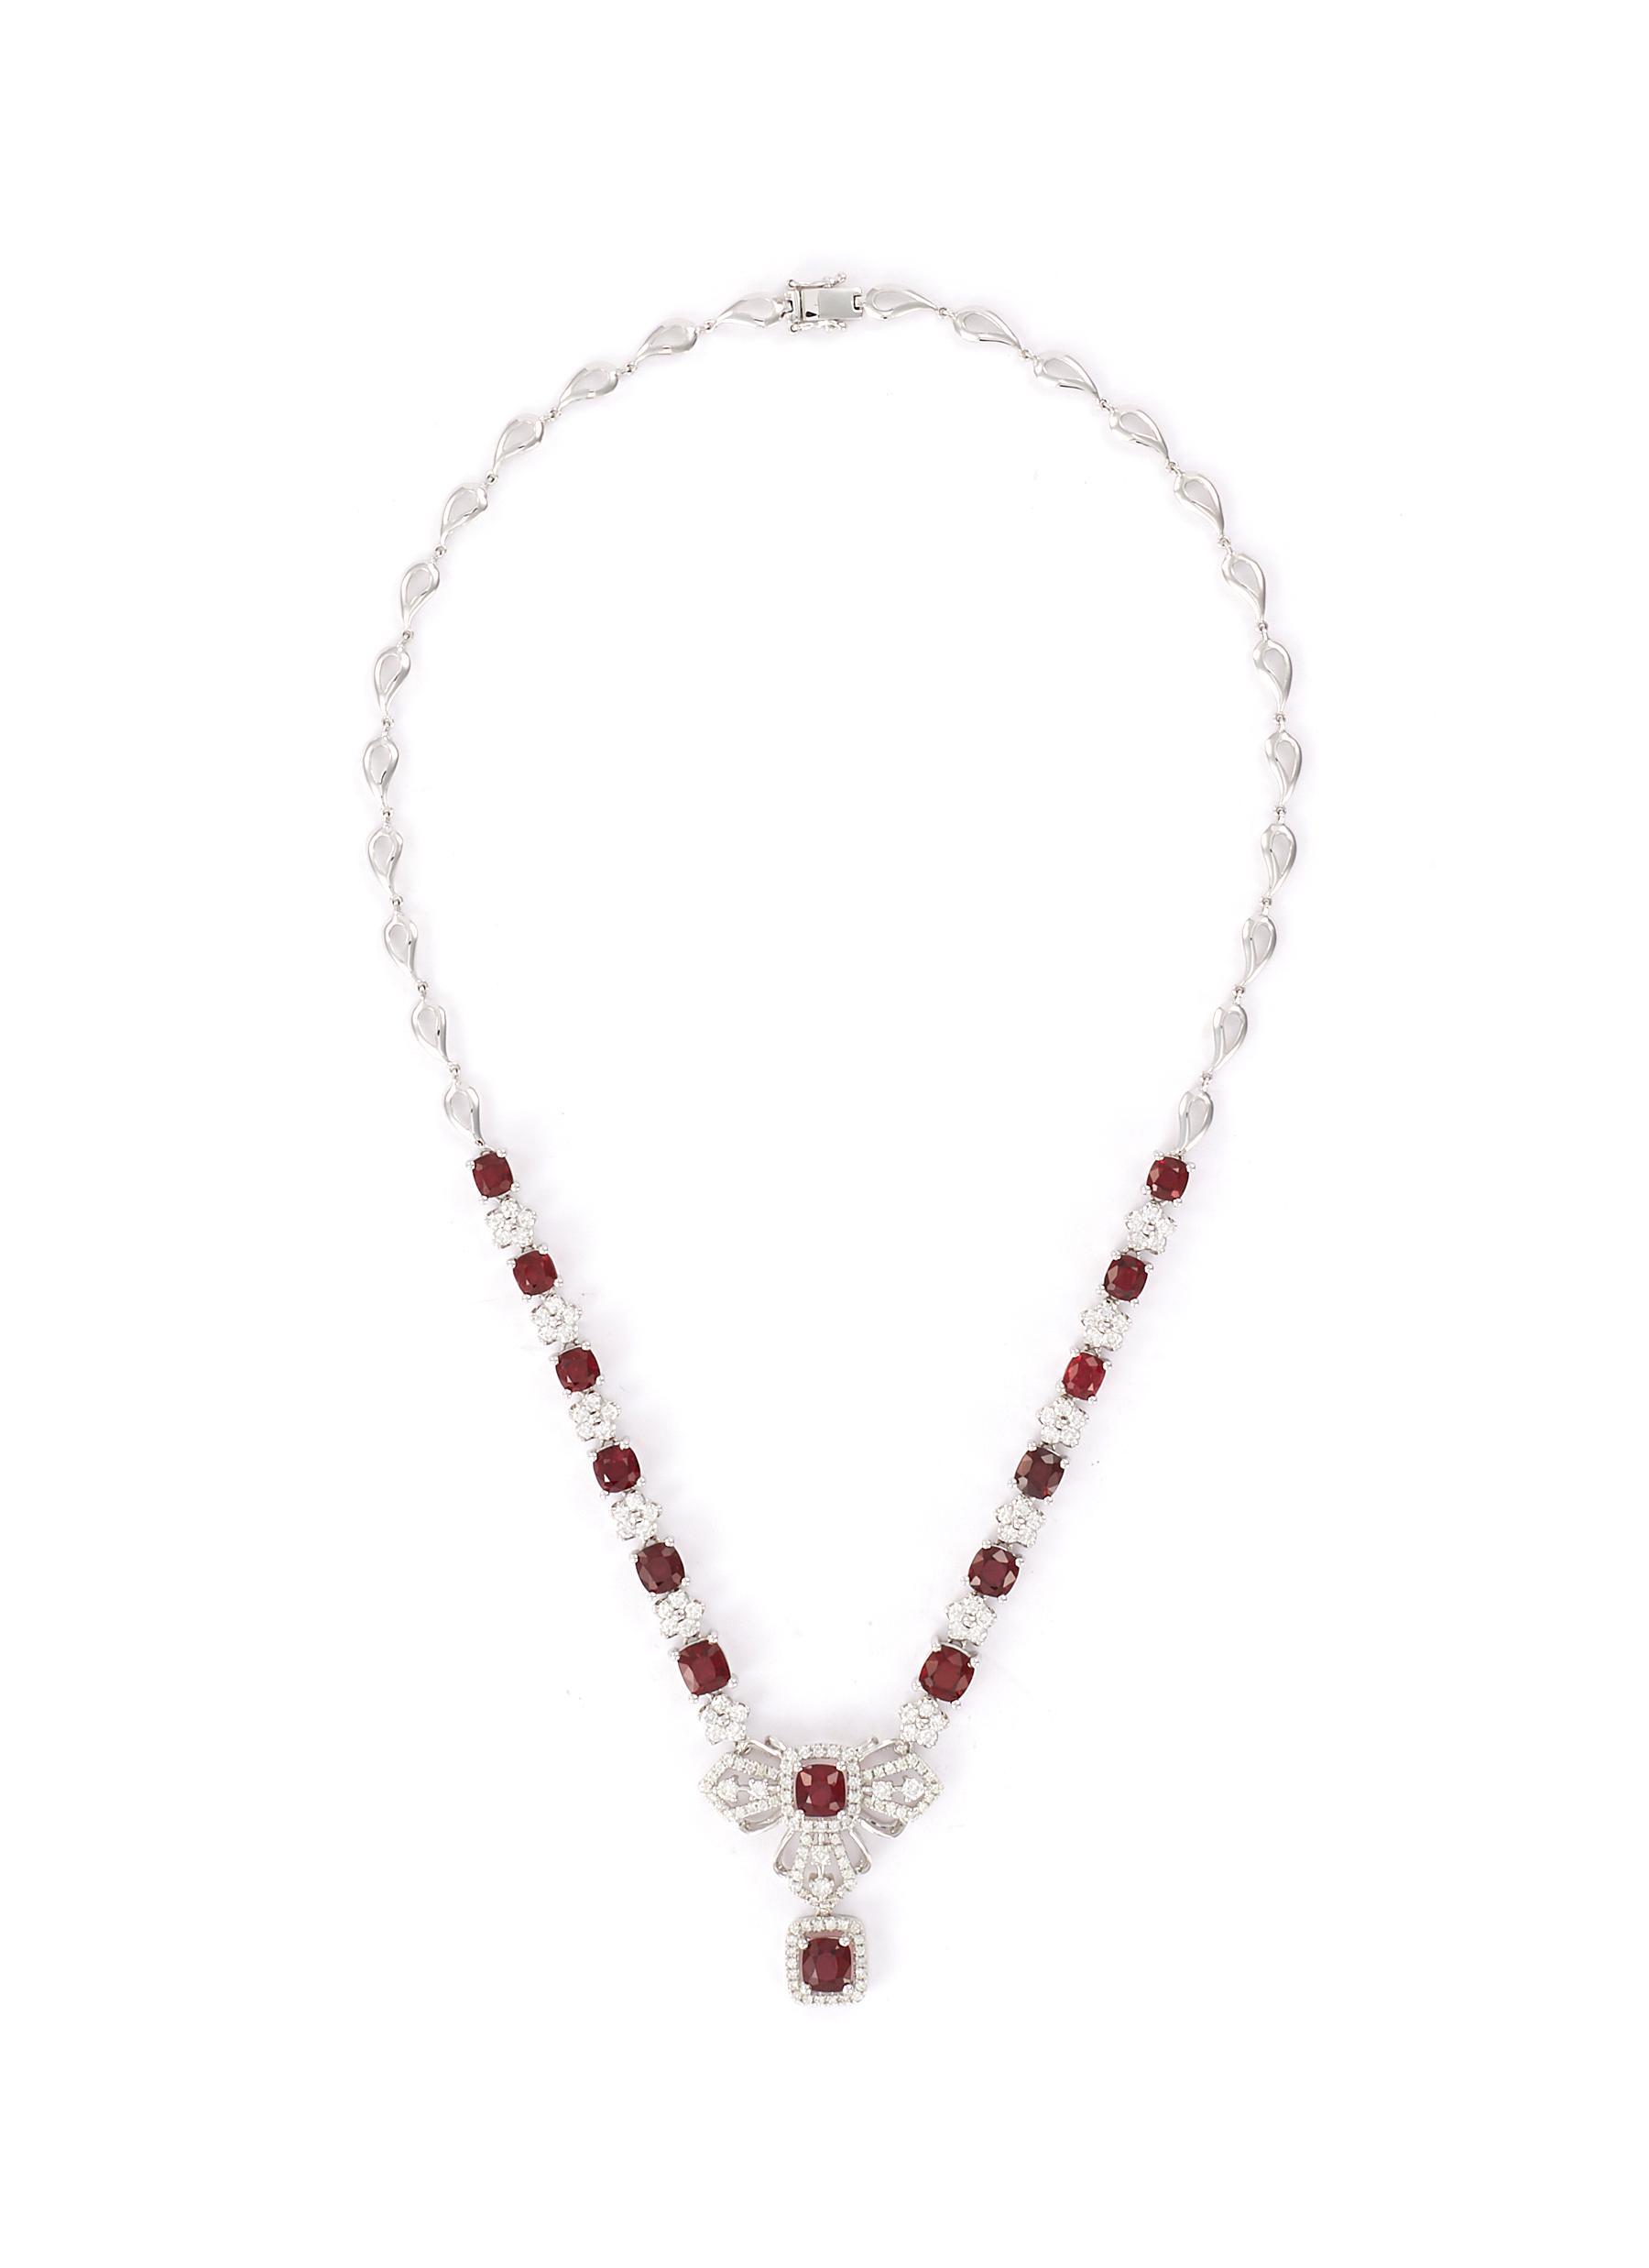 Diamond sapphire 18k white gold pendant necklace